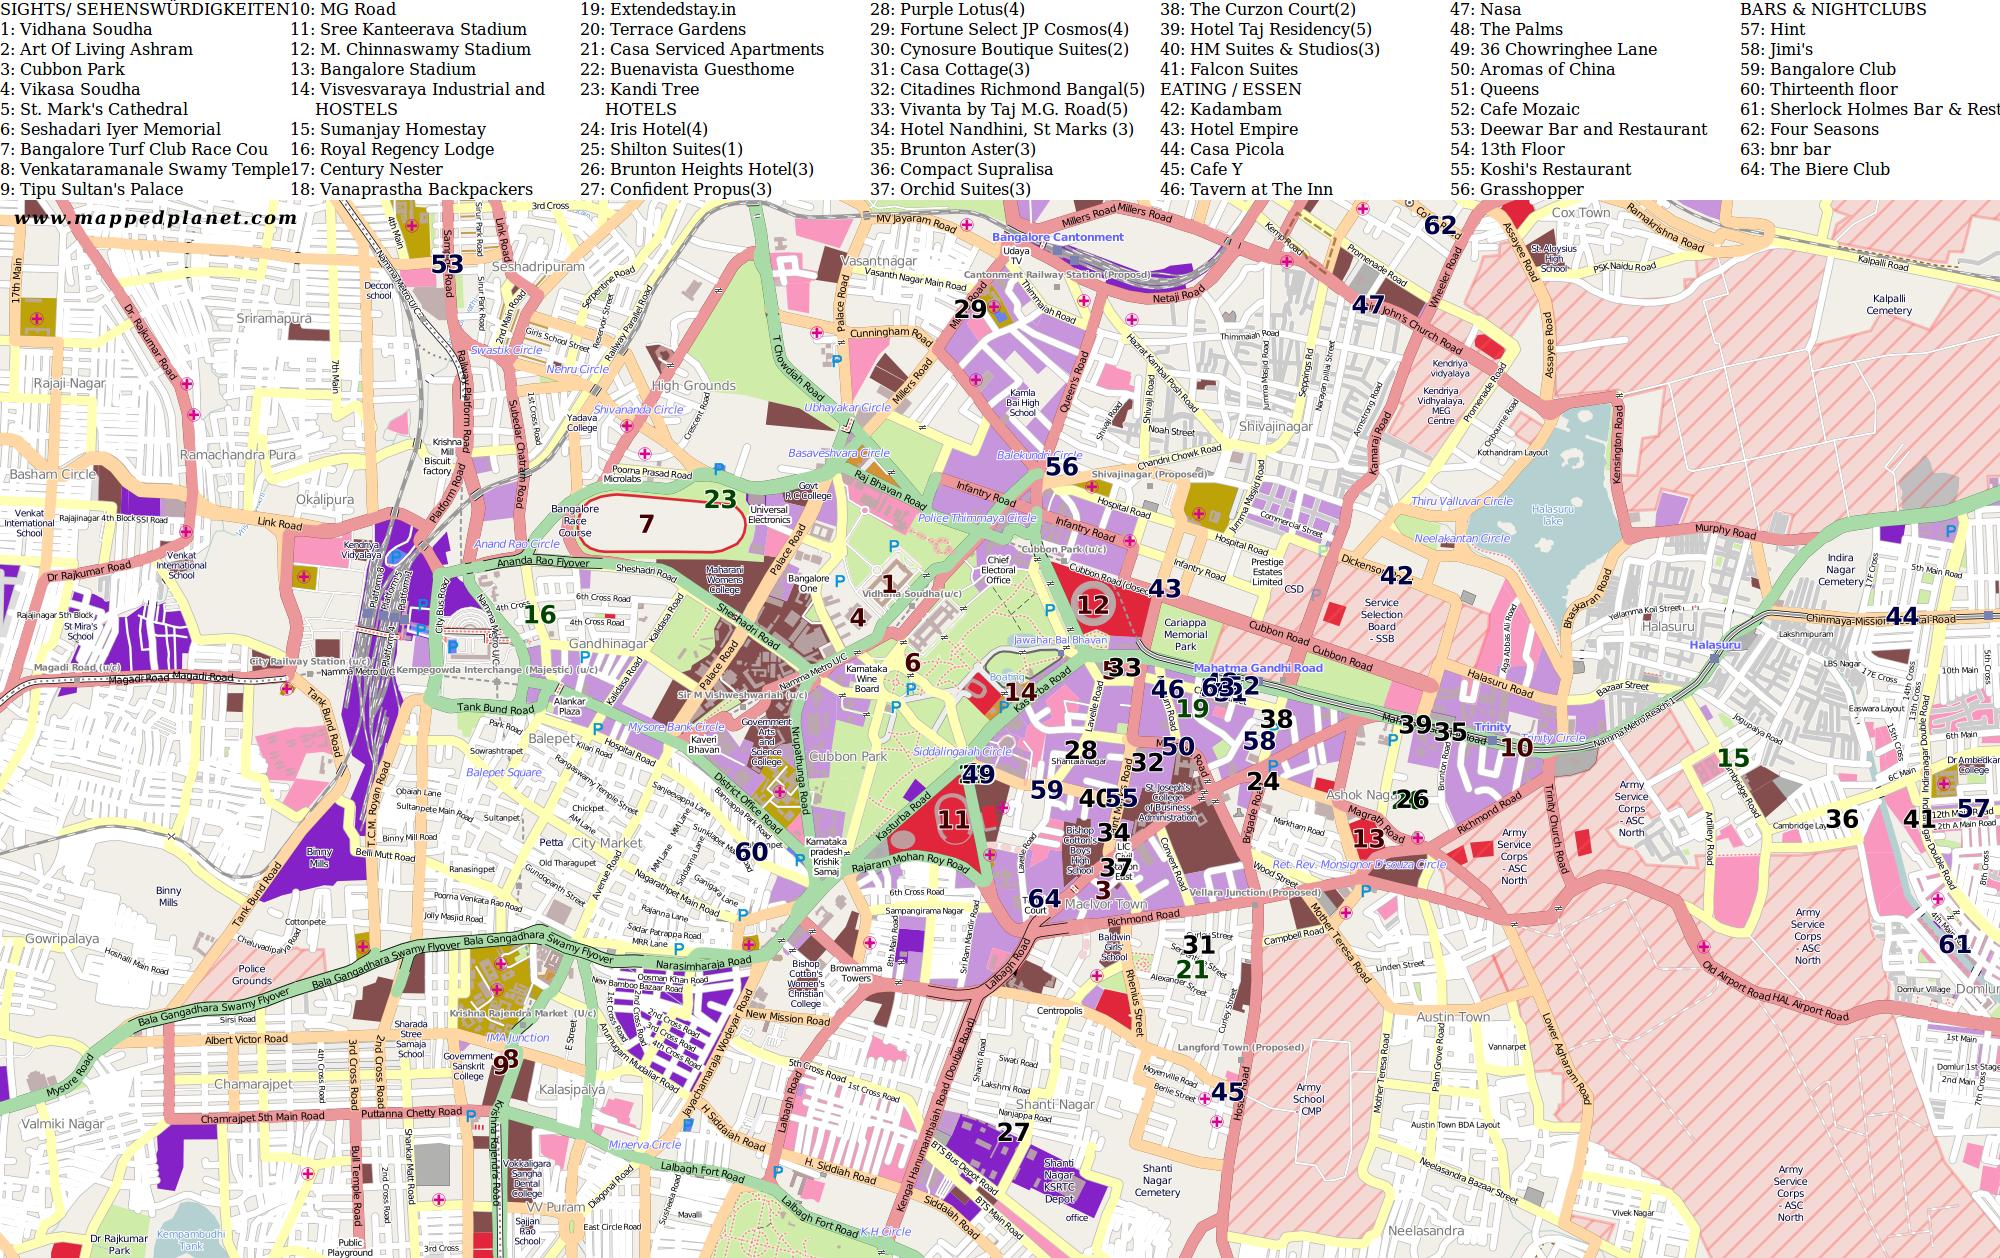 Free dating sites india bangalore on map